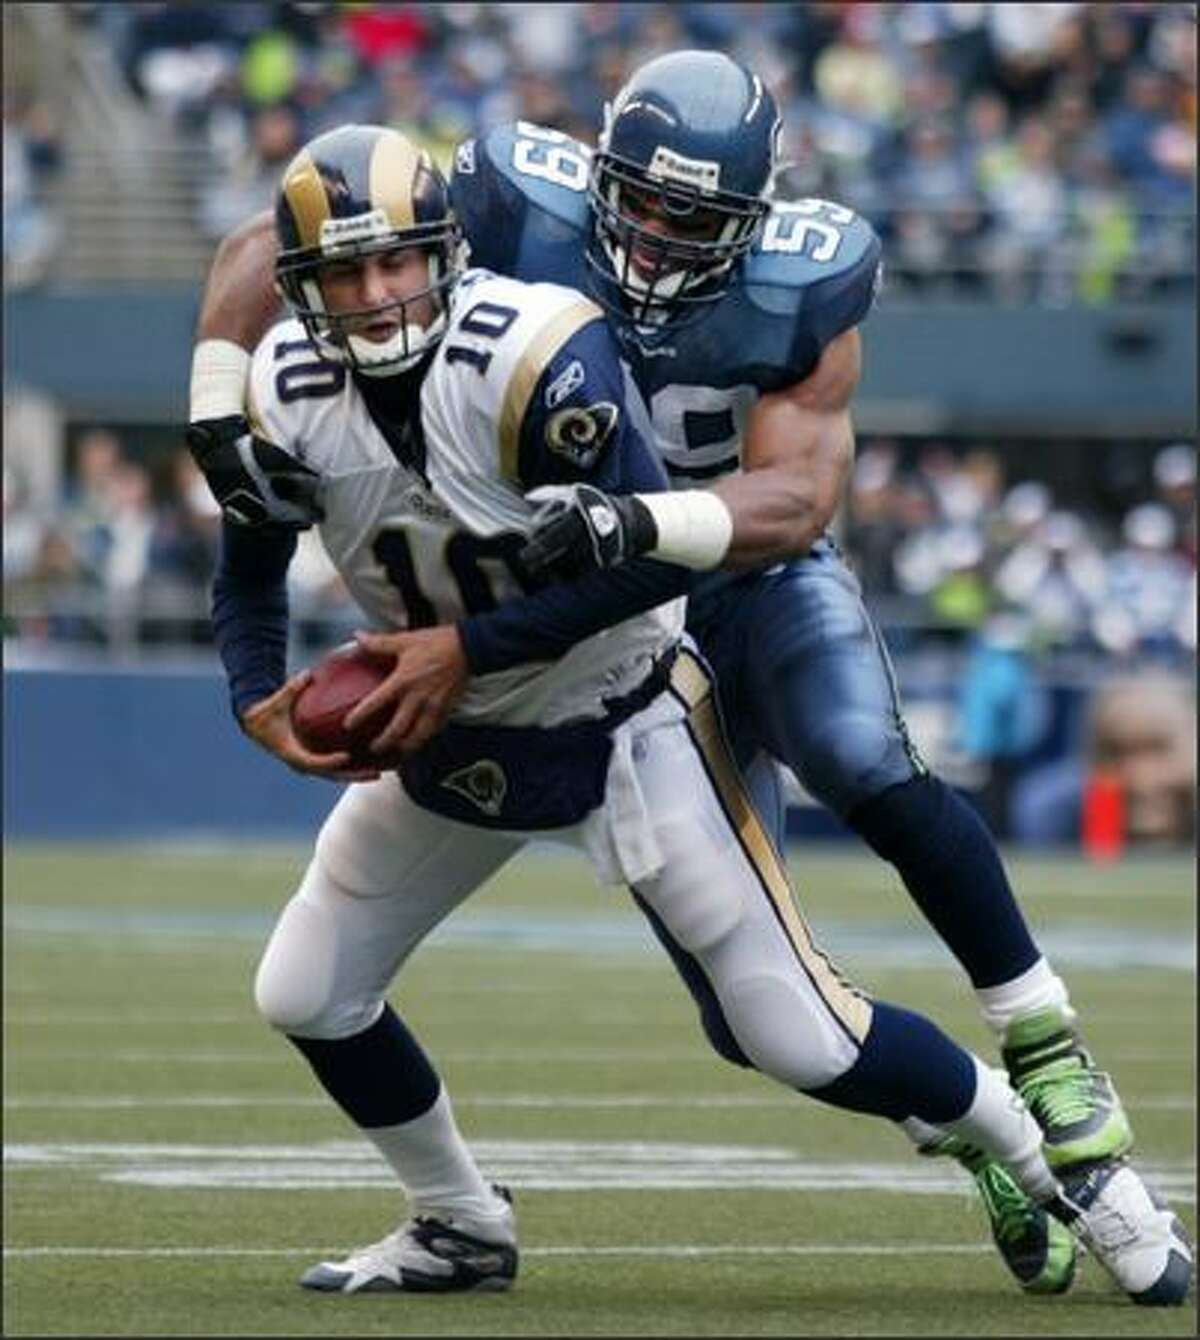 Seattle Seahawks linebacker Julian Peterson sacks St. Louis Rams quarterback Marc Bulger during the 1st quarter.